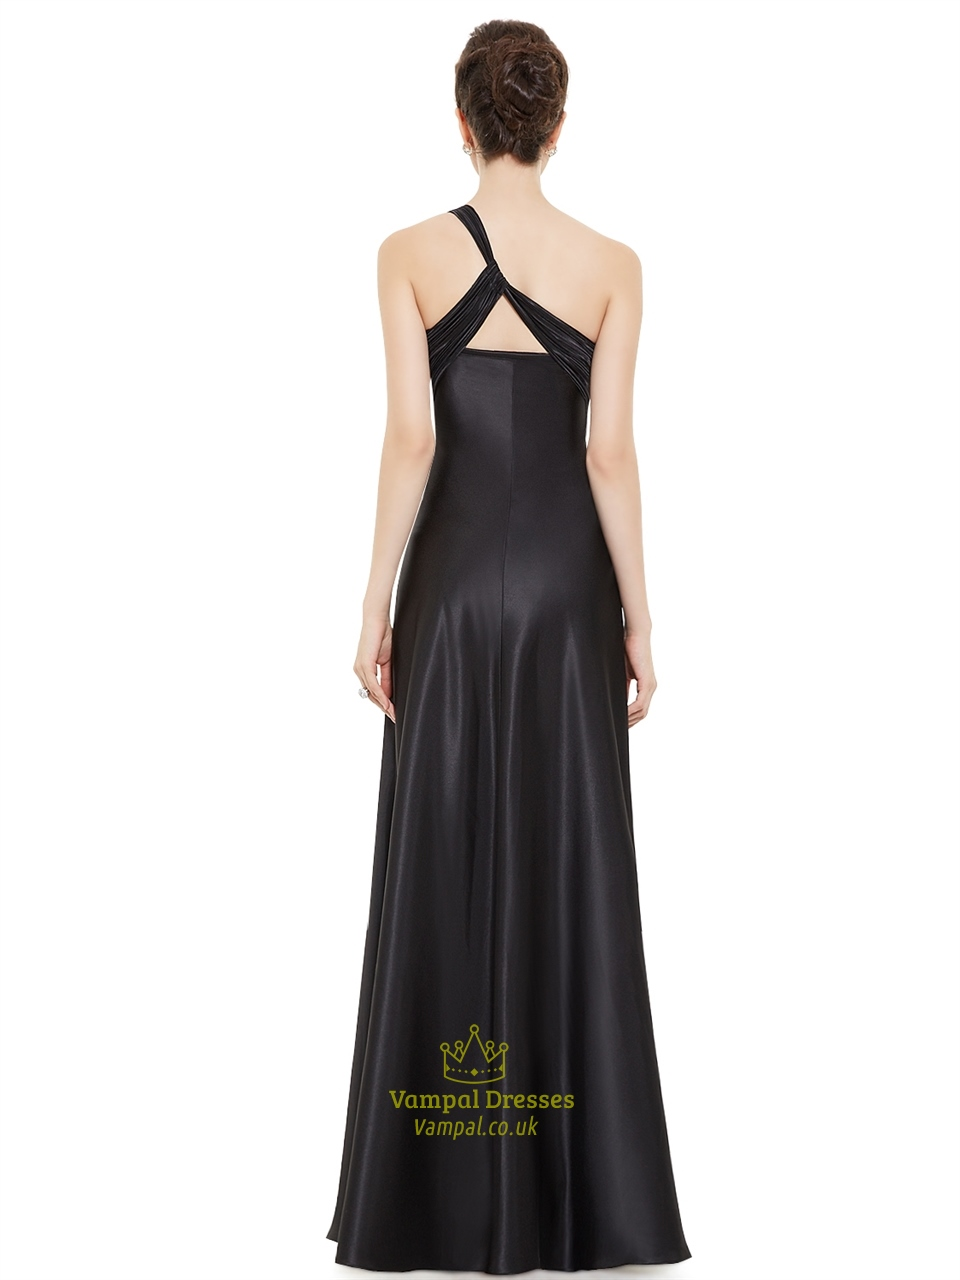 Black One Shoulder Empire Waist Bridesmaid Dresses With